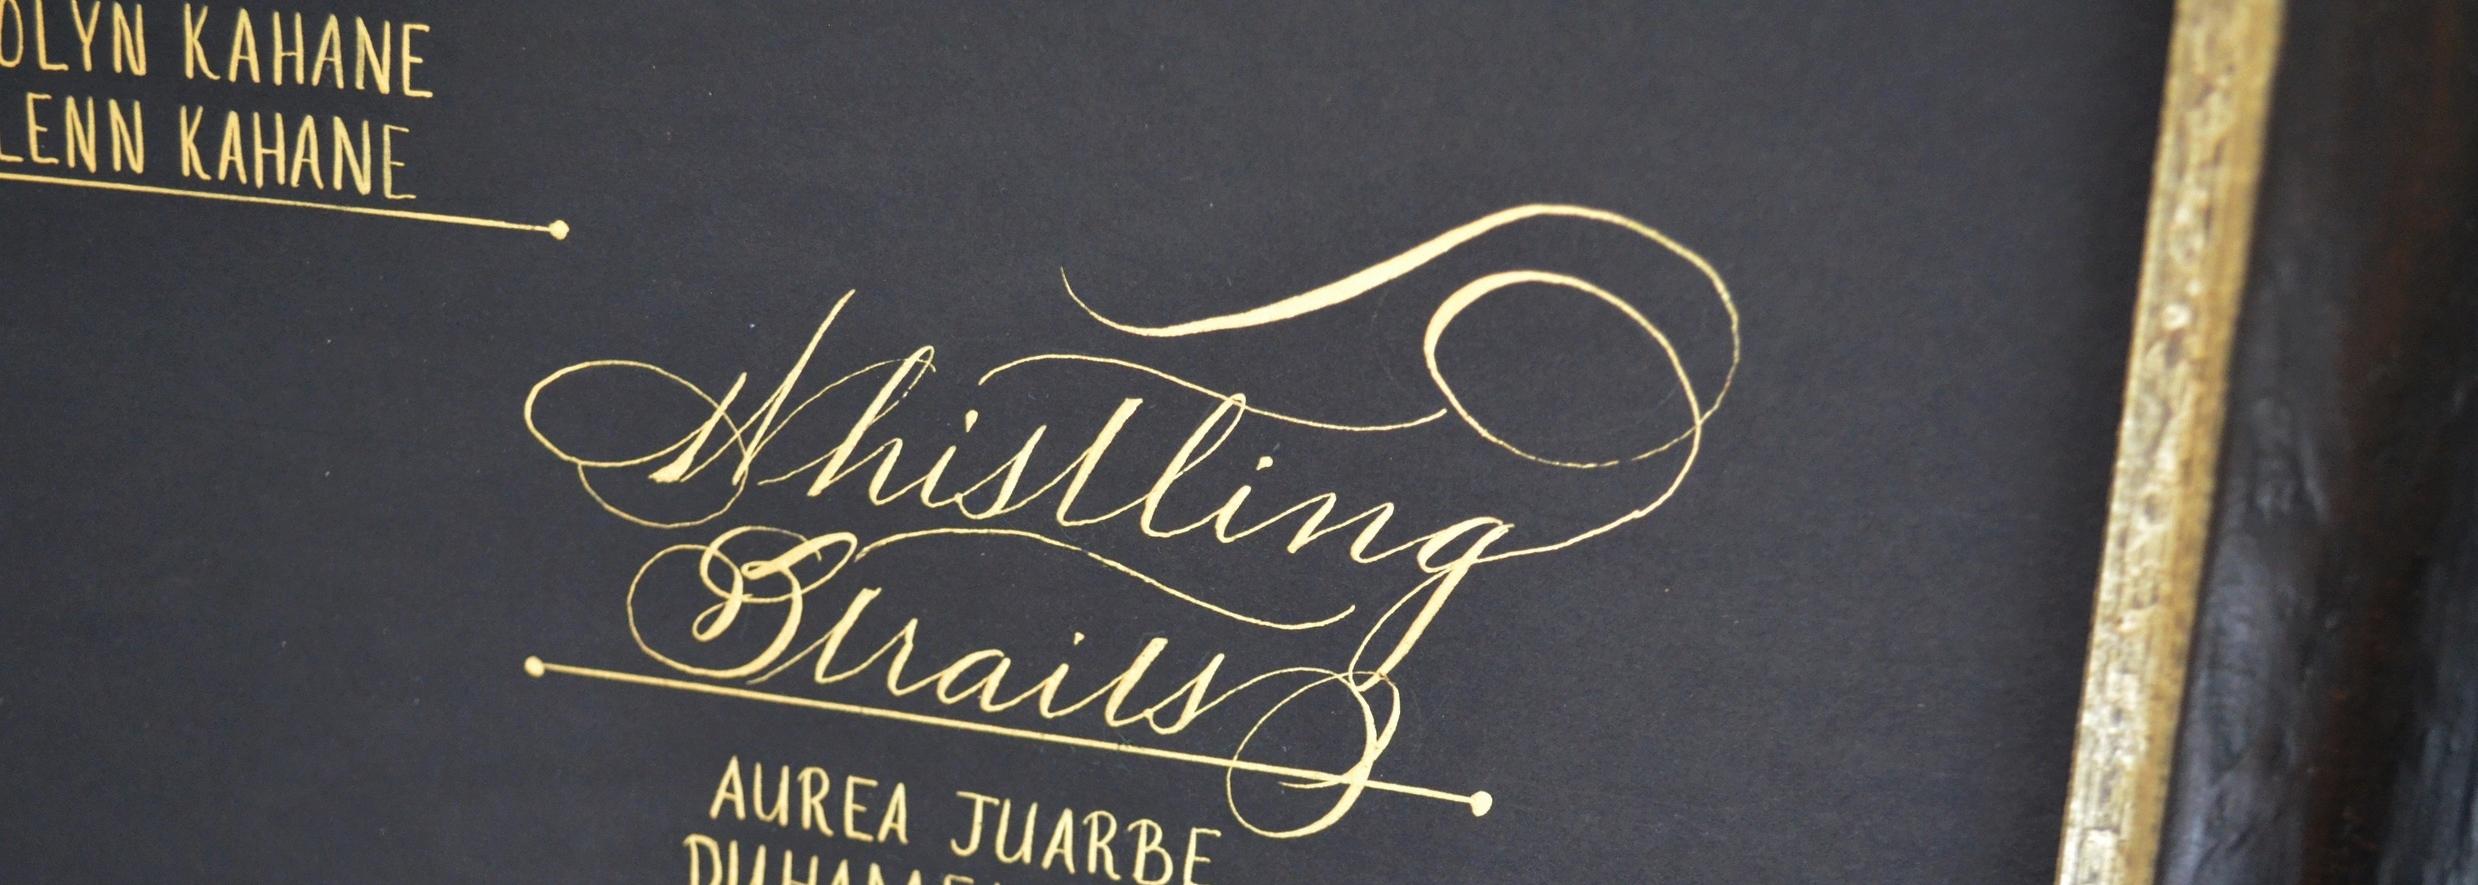 Houston Calligraphy Calligrapher 11 June 2015 9.jpg